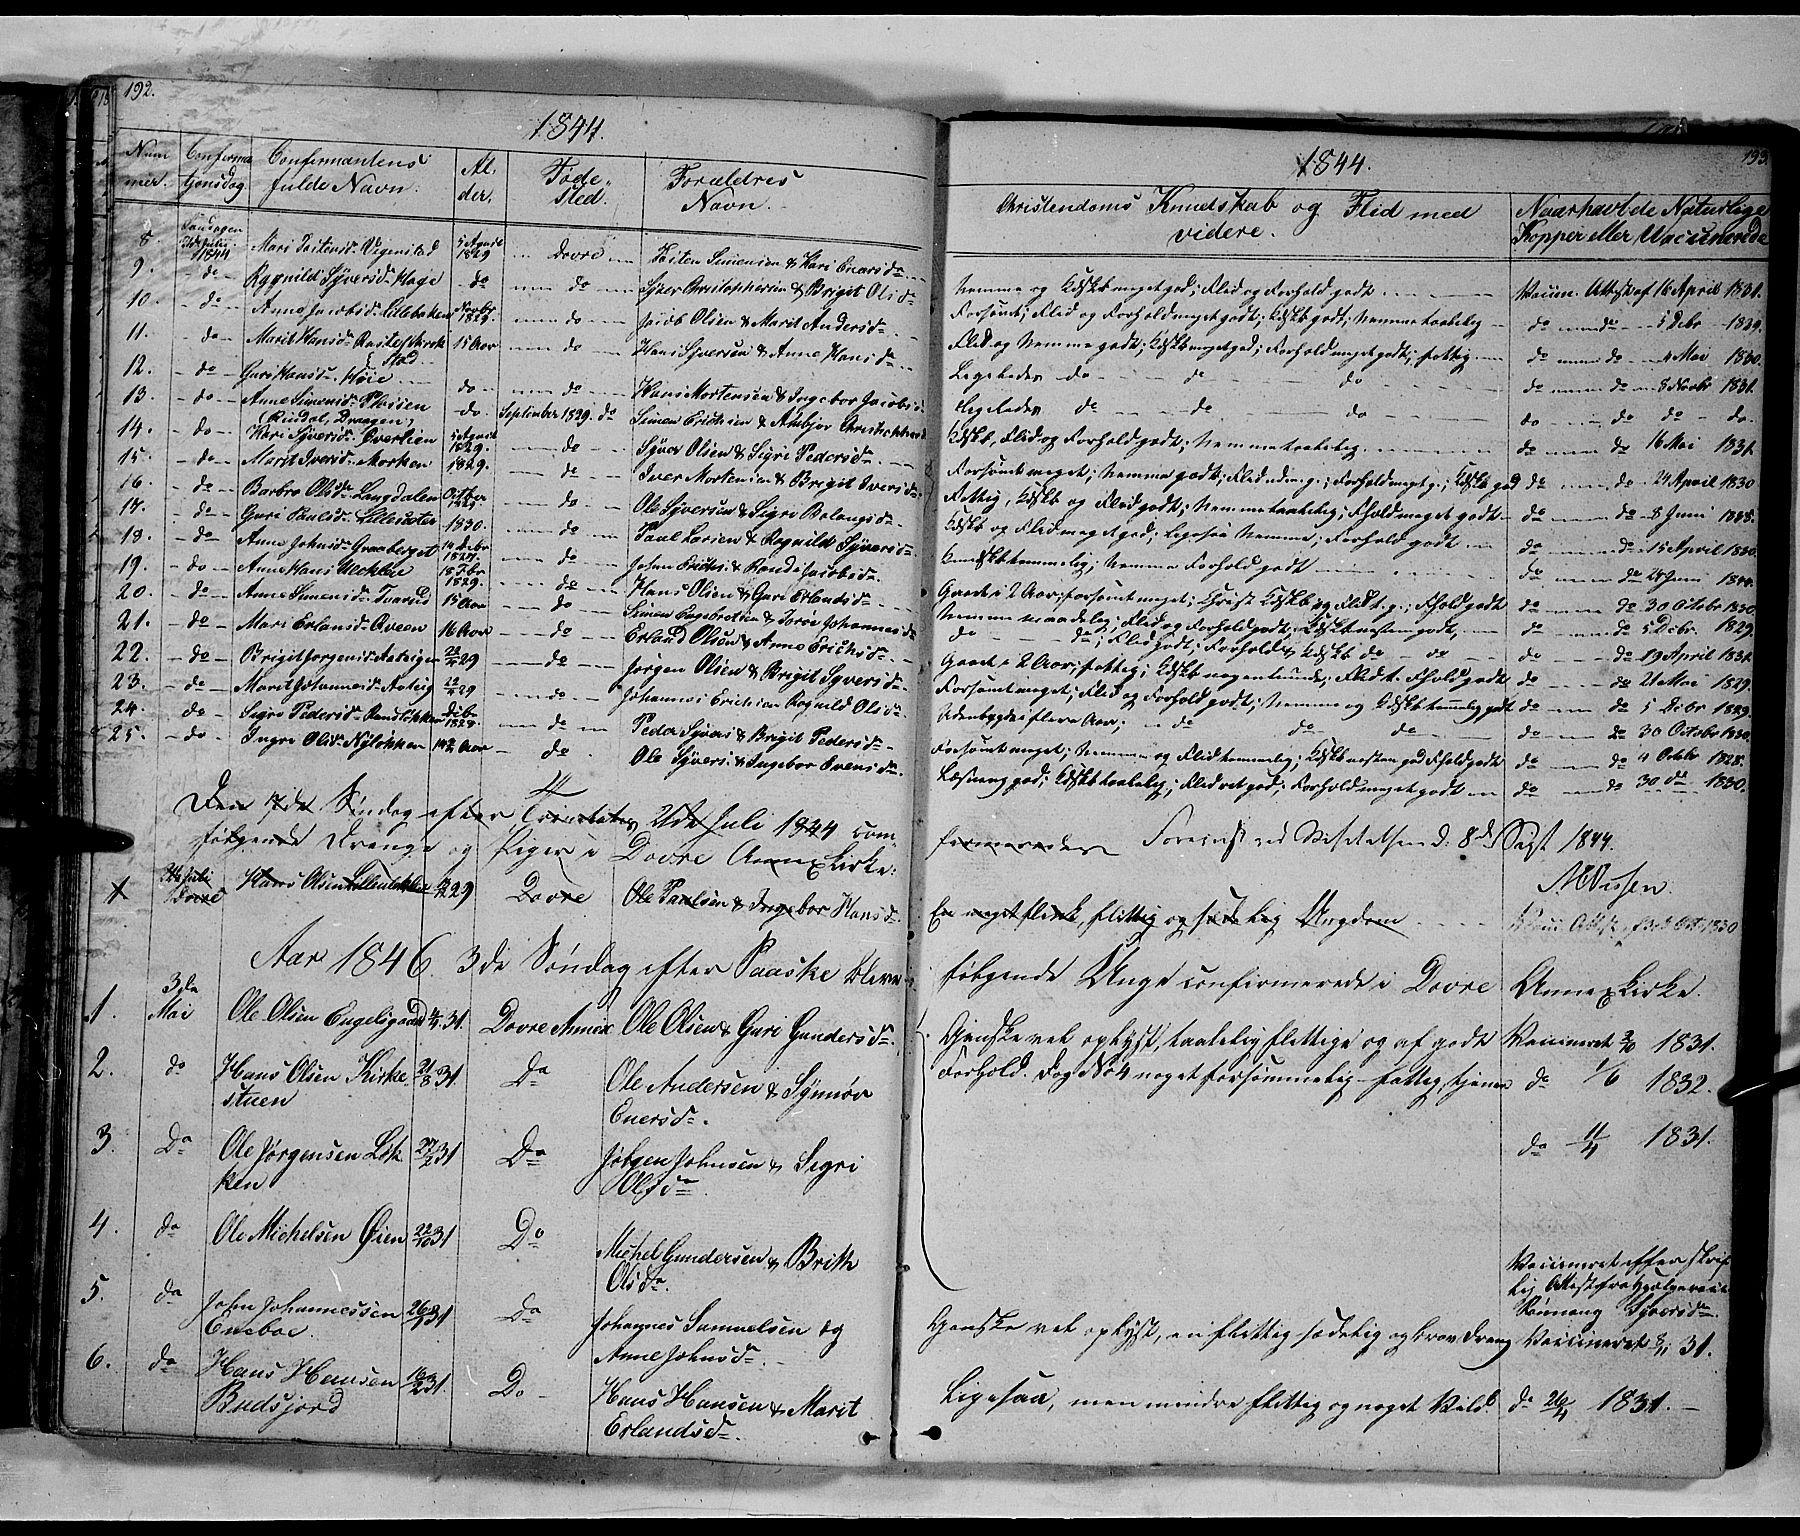 SAH, Lesja prestekontor, Klokkerbok nr. 3, 1842-1862, s. 192-193